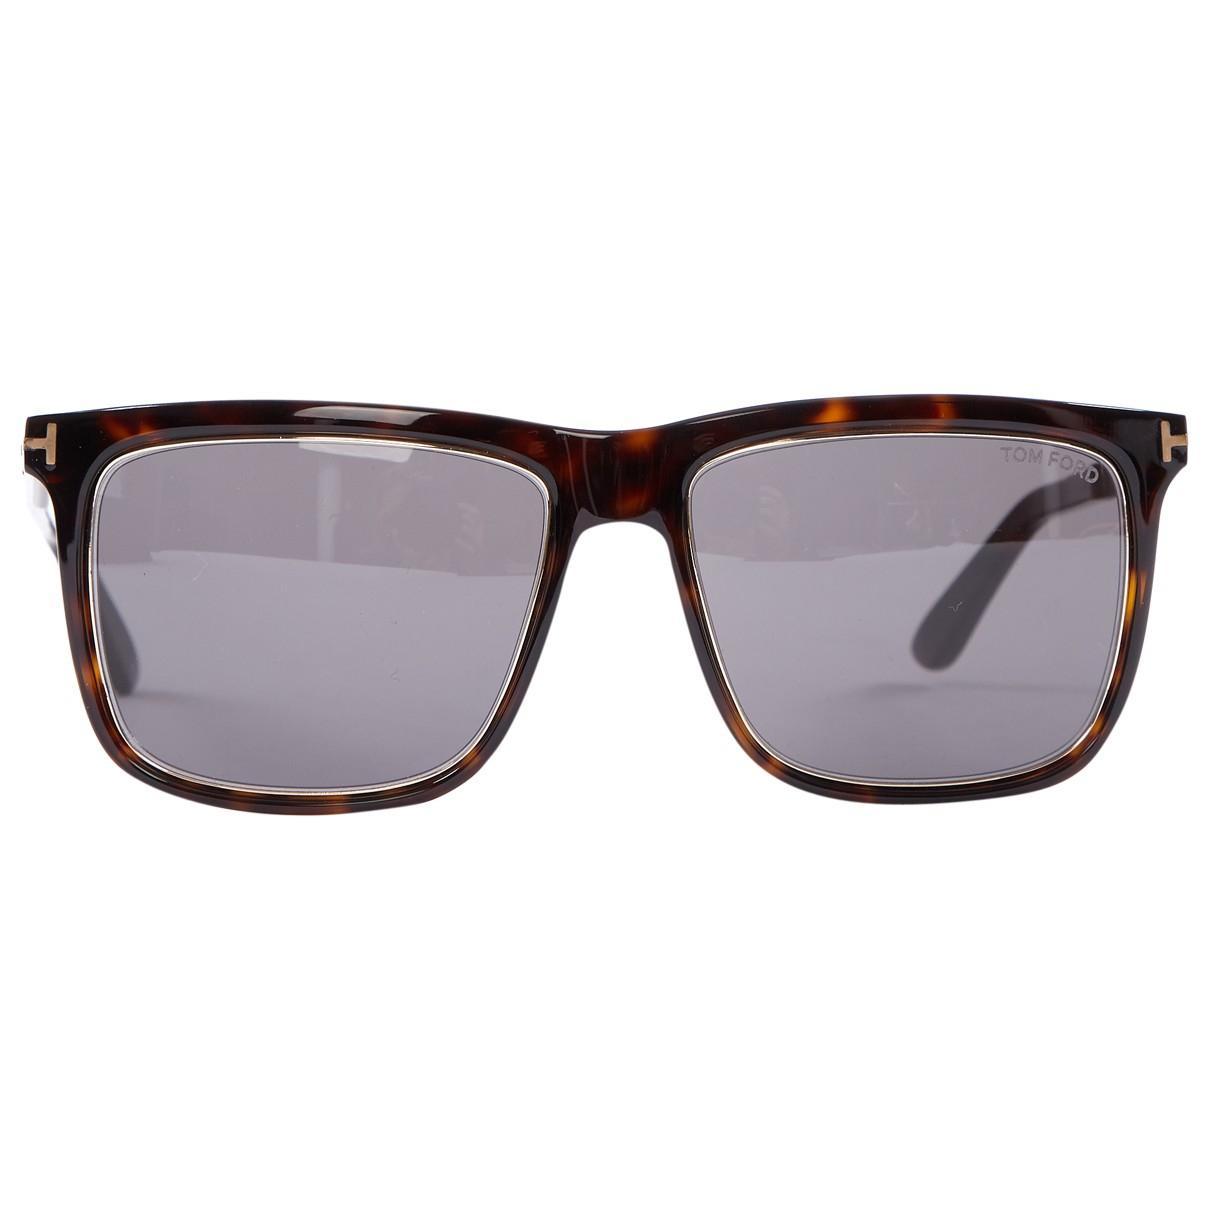 e8e6a45f26 Tom Ford Oversized Sunglasses in Brown - Lyst